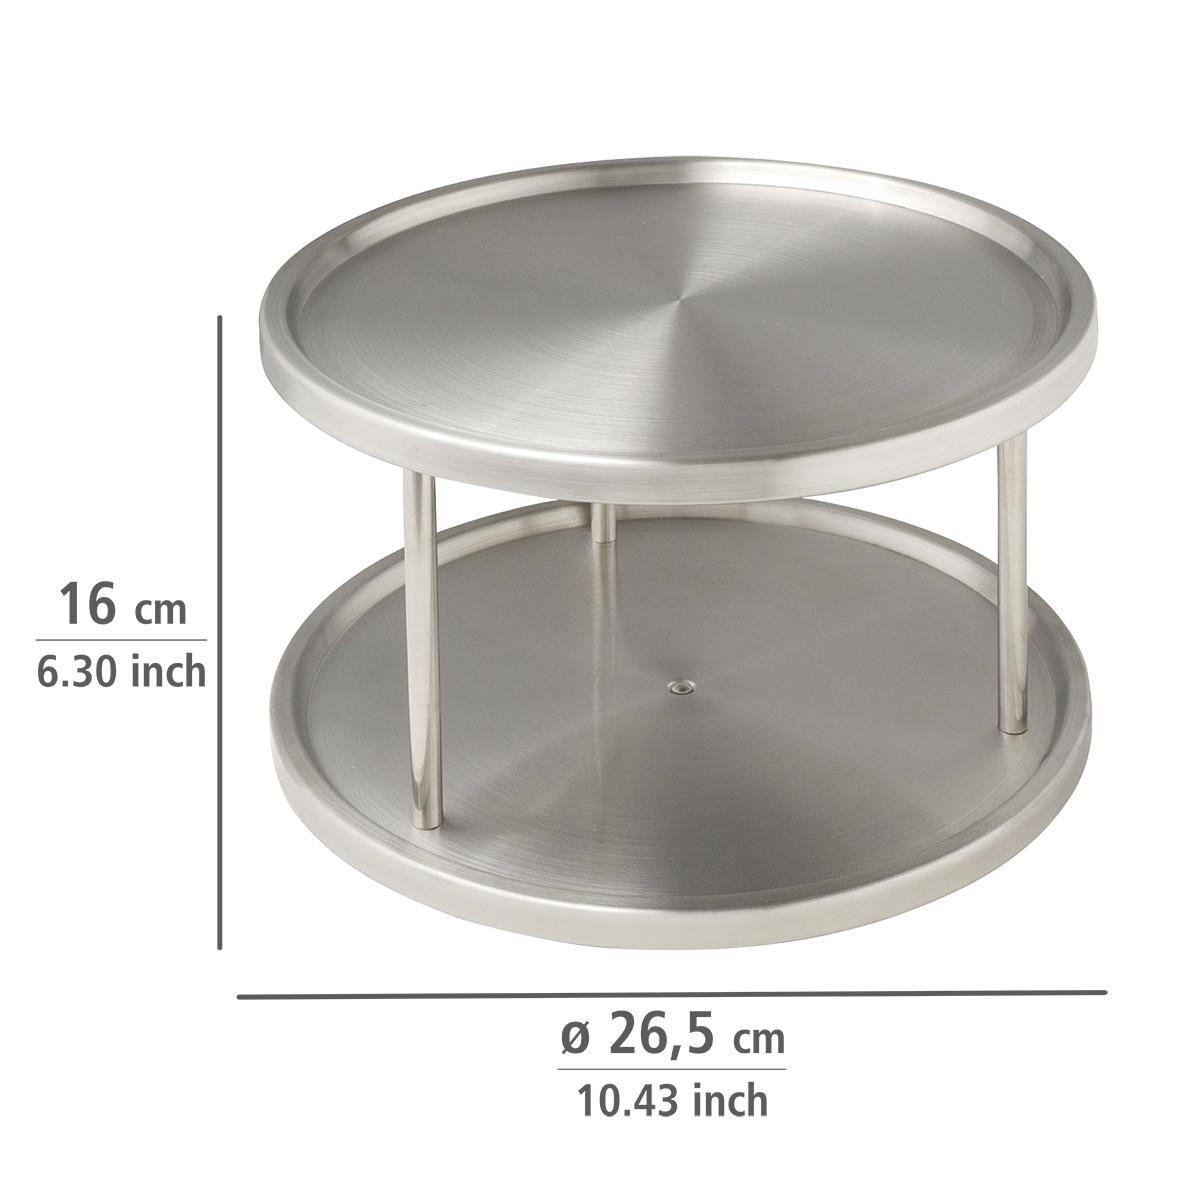 Full Size of Küchenkarussell Blockiert Wenko Wohnzimmer Küchenkarussell Blockiert